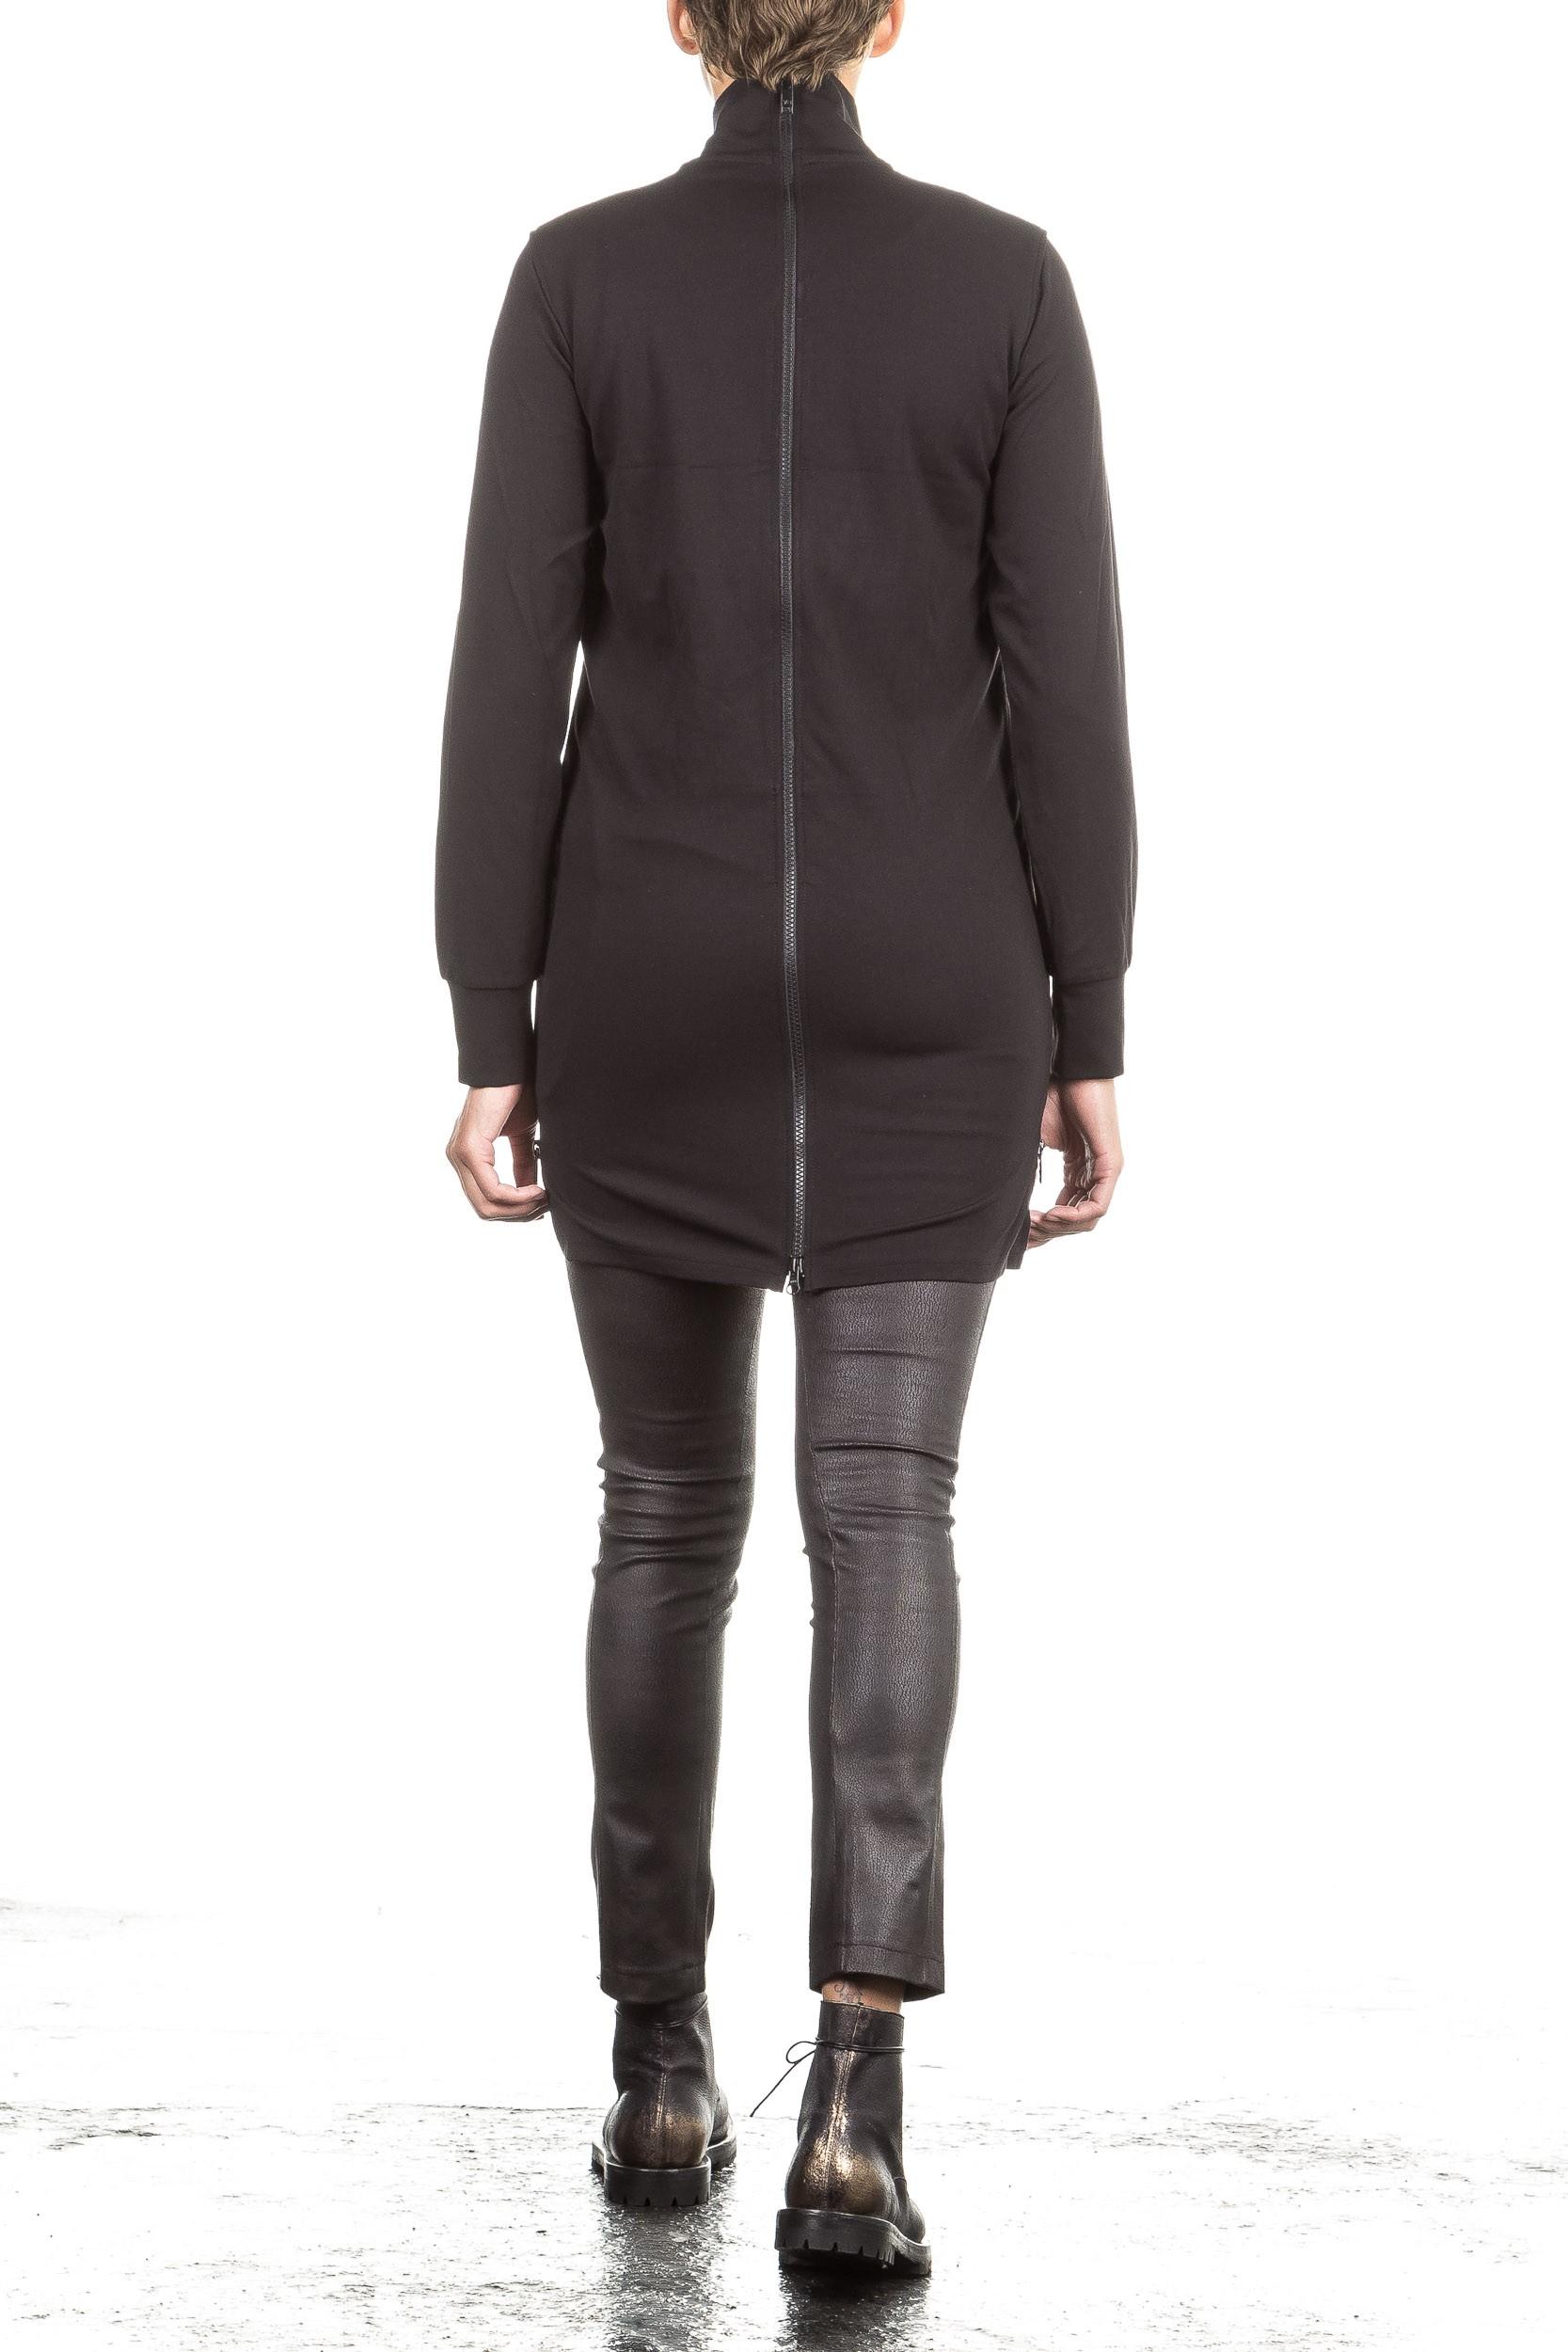 Y 3 Damen Sweat Mantel LUX TRACK schwarz   LuxuryLoft